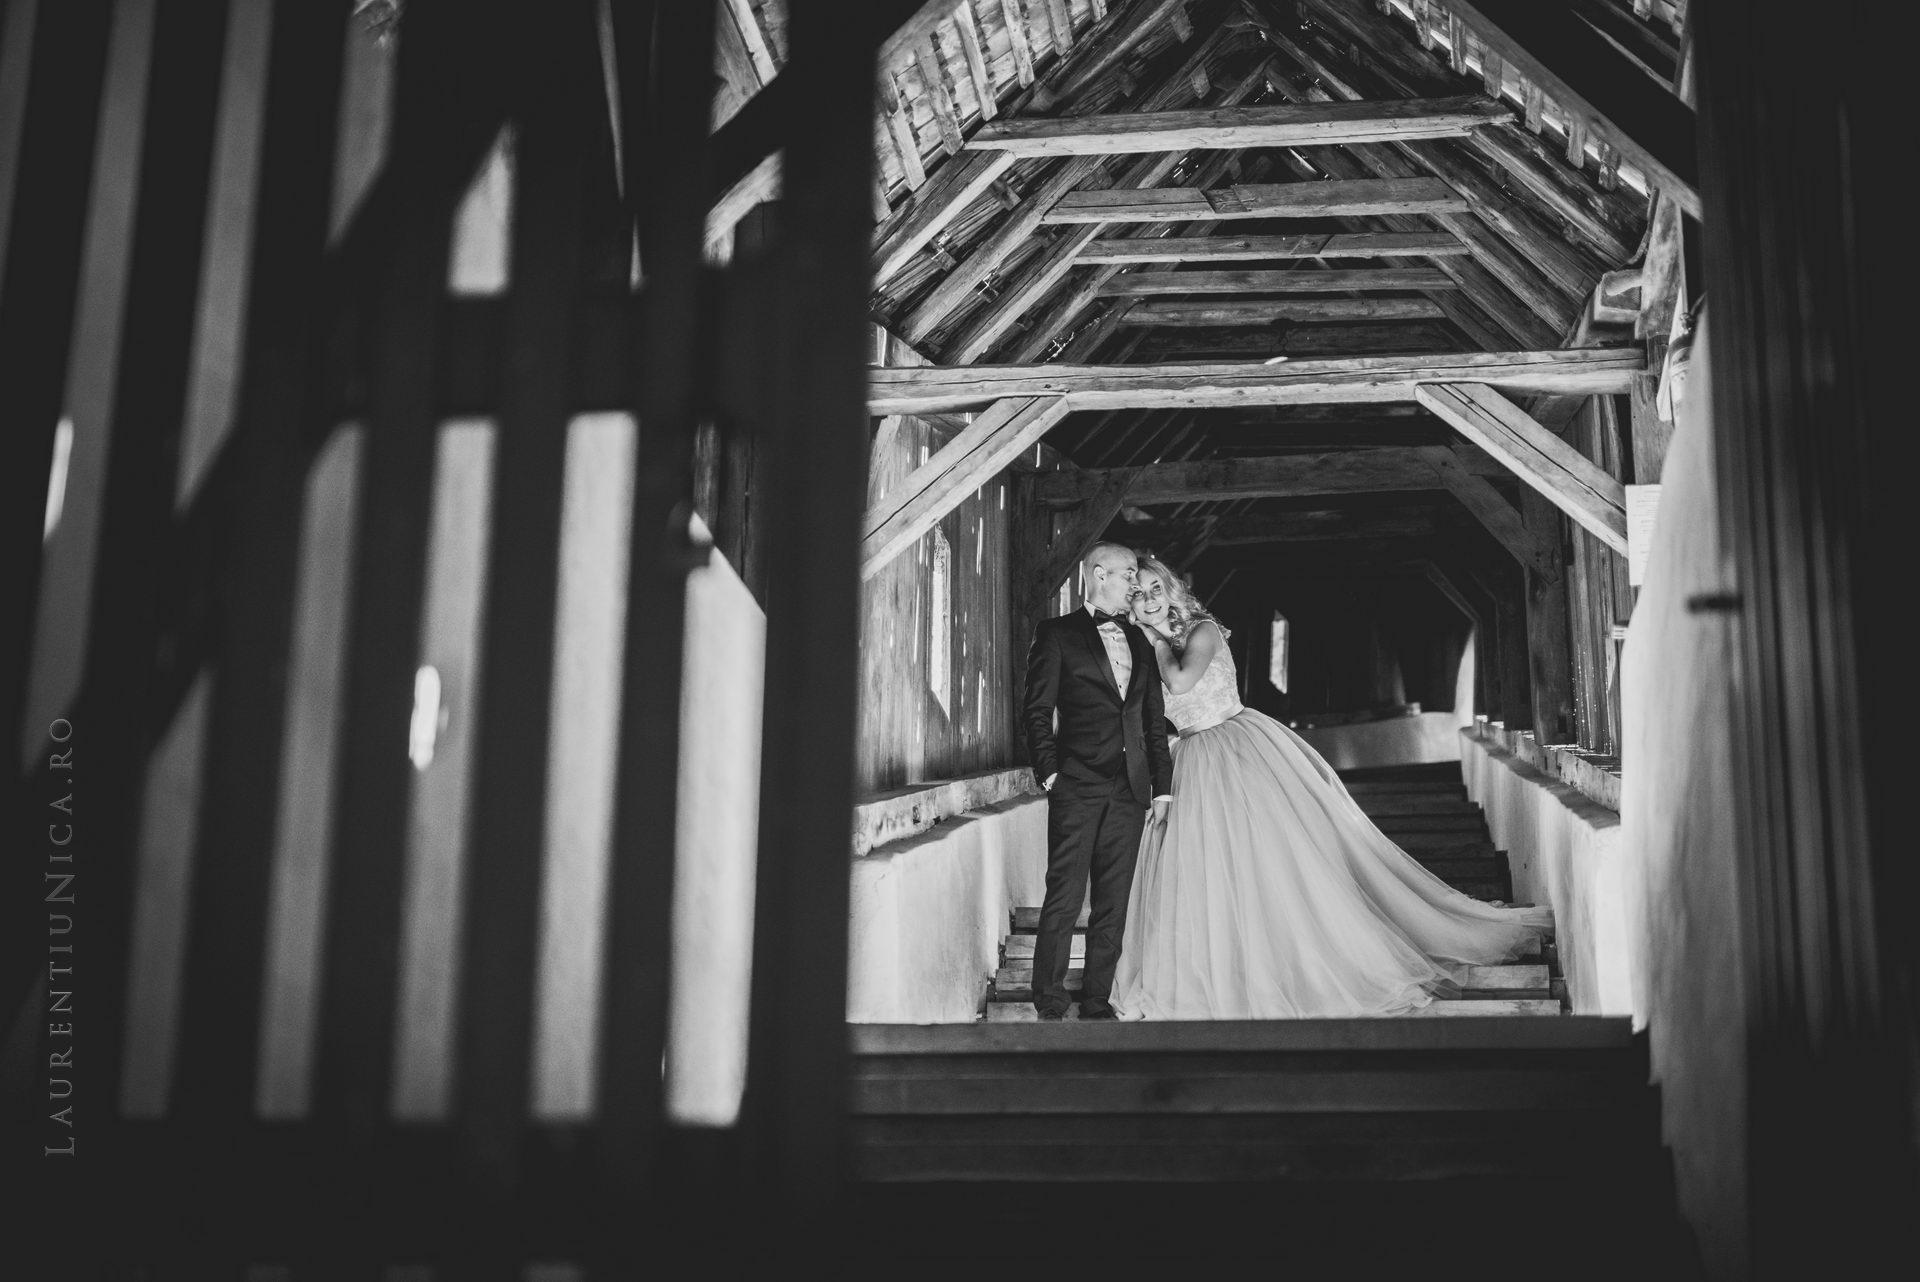 lavinia si adi fotograf laurentiu nica sighisoara biertan 025 - Lavinia & Adi | Fotografii After Wedding | Sighisoara & Biertan